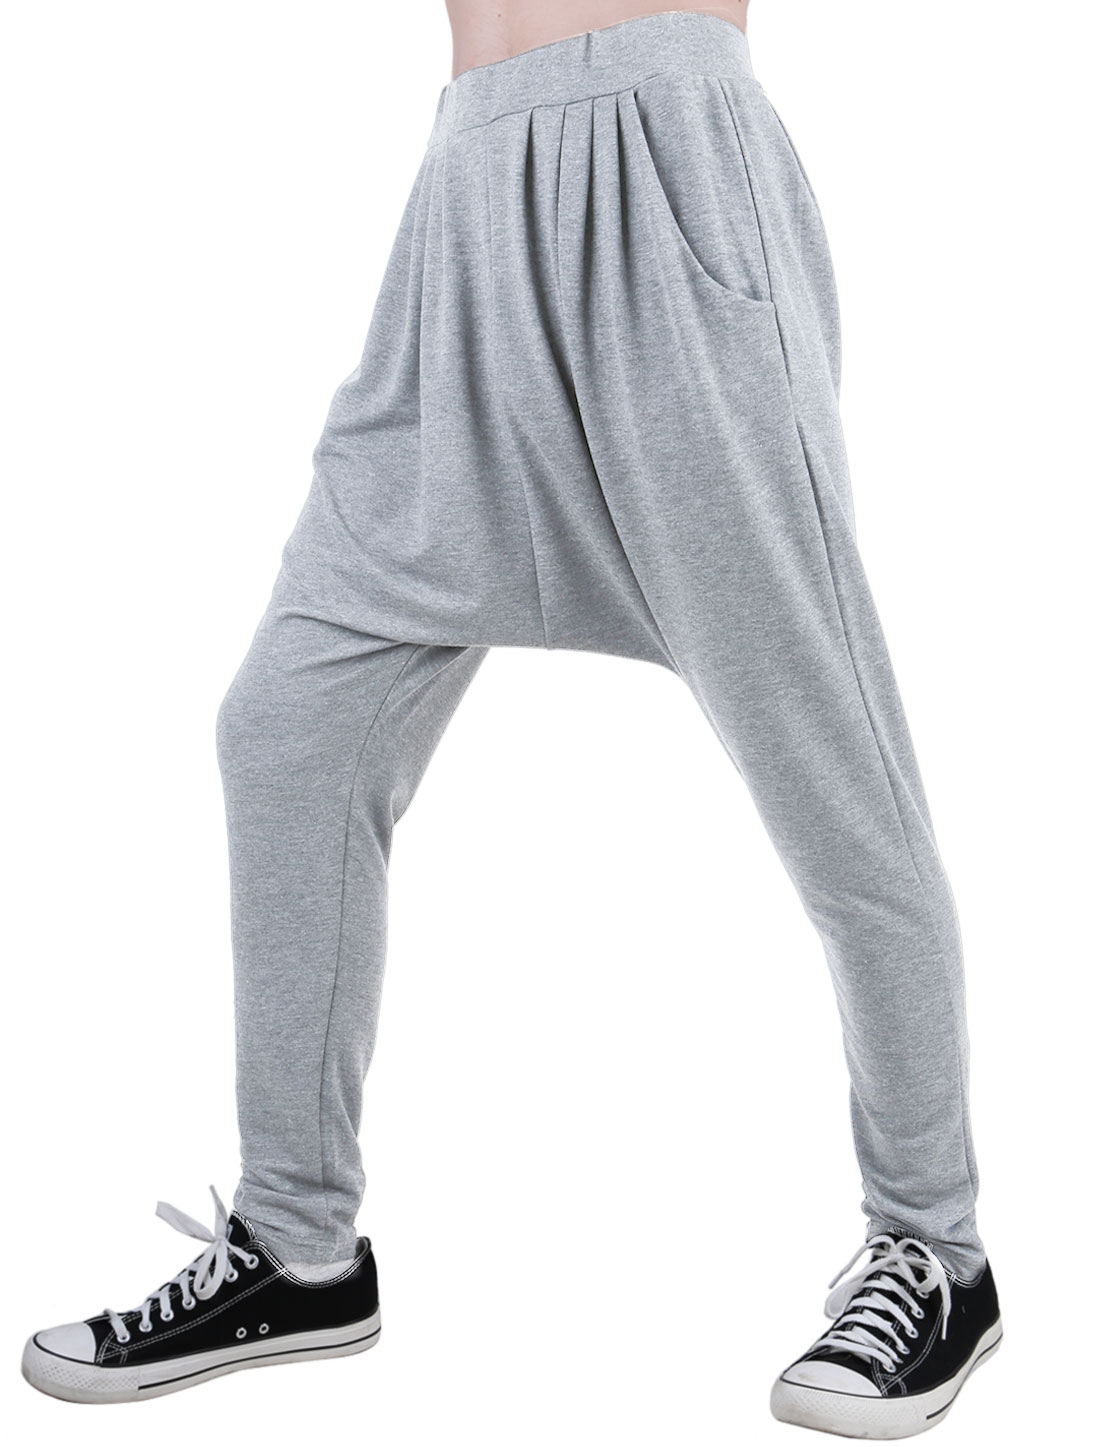 Men Light Gray Casual Elastic Waist Harem Pants W32/34